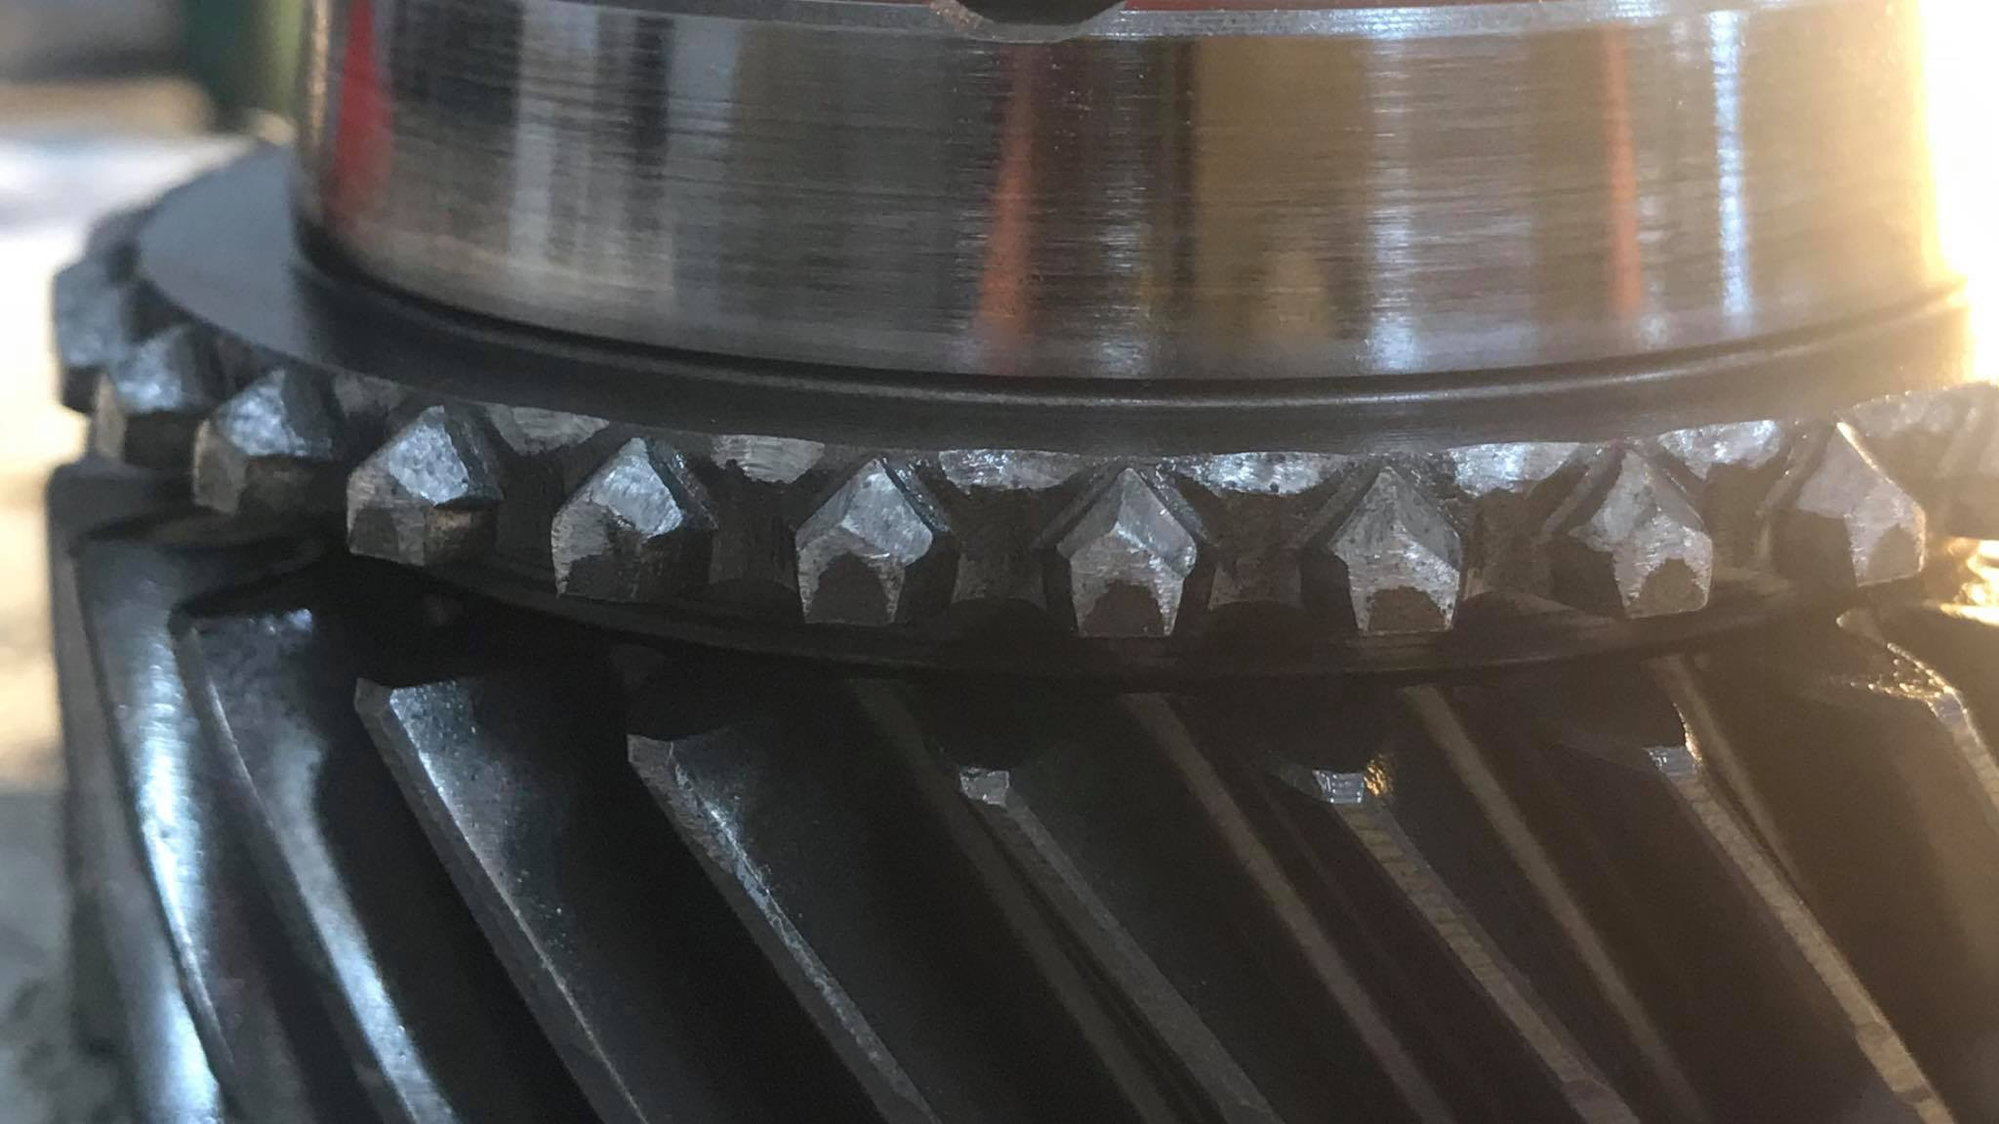 B16 Trans  3rd Gear Grind: Synchro, Gear, Sleeve, etc  Inspection